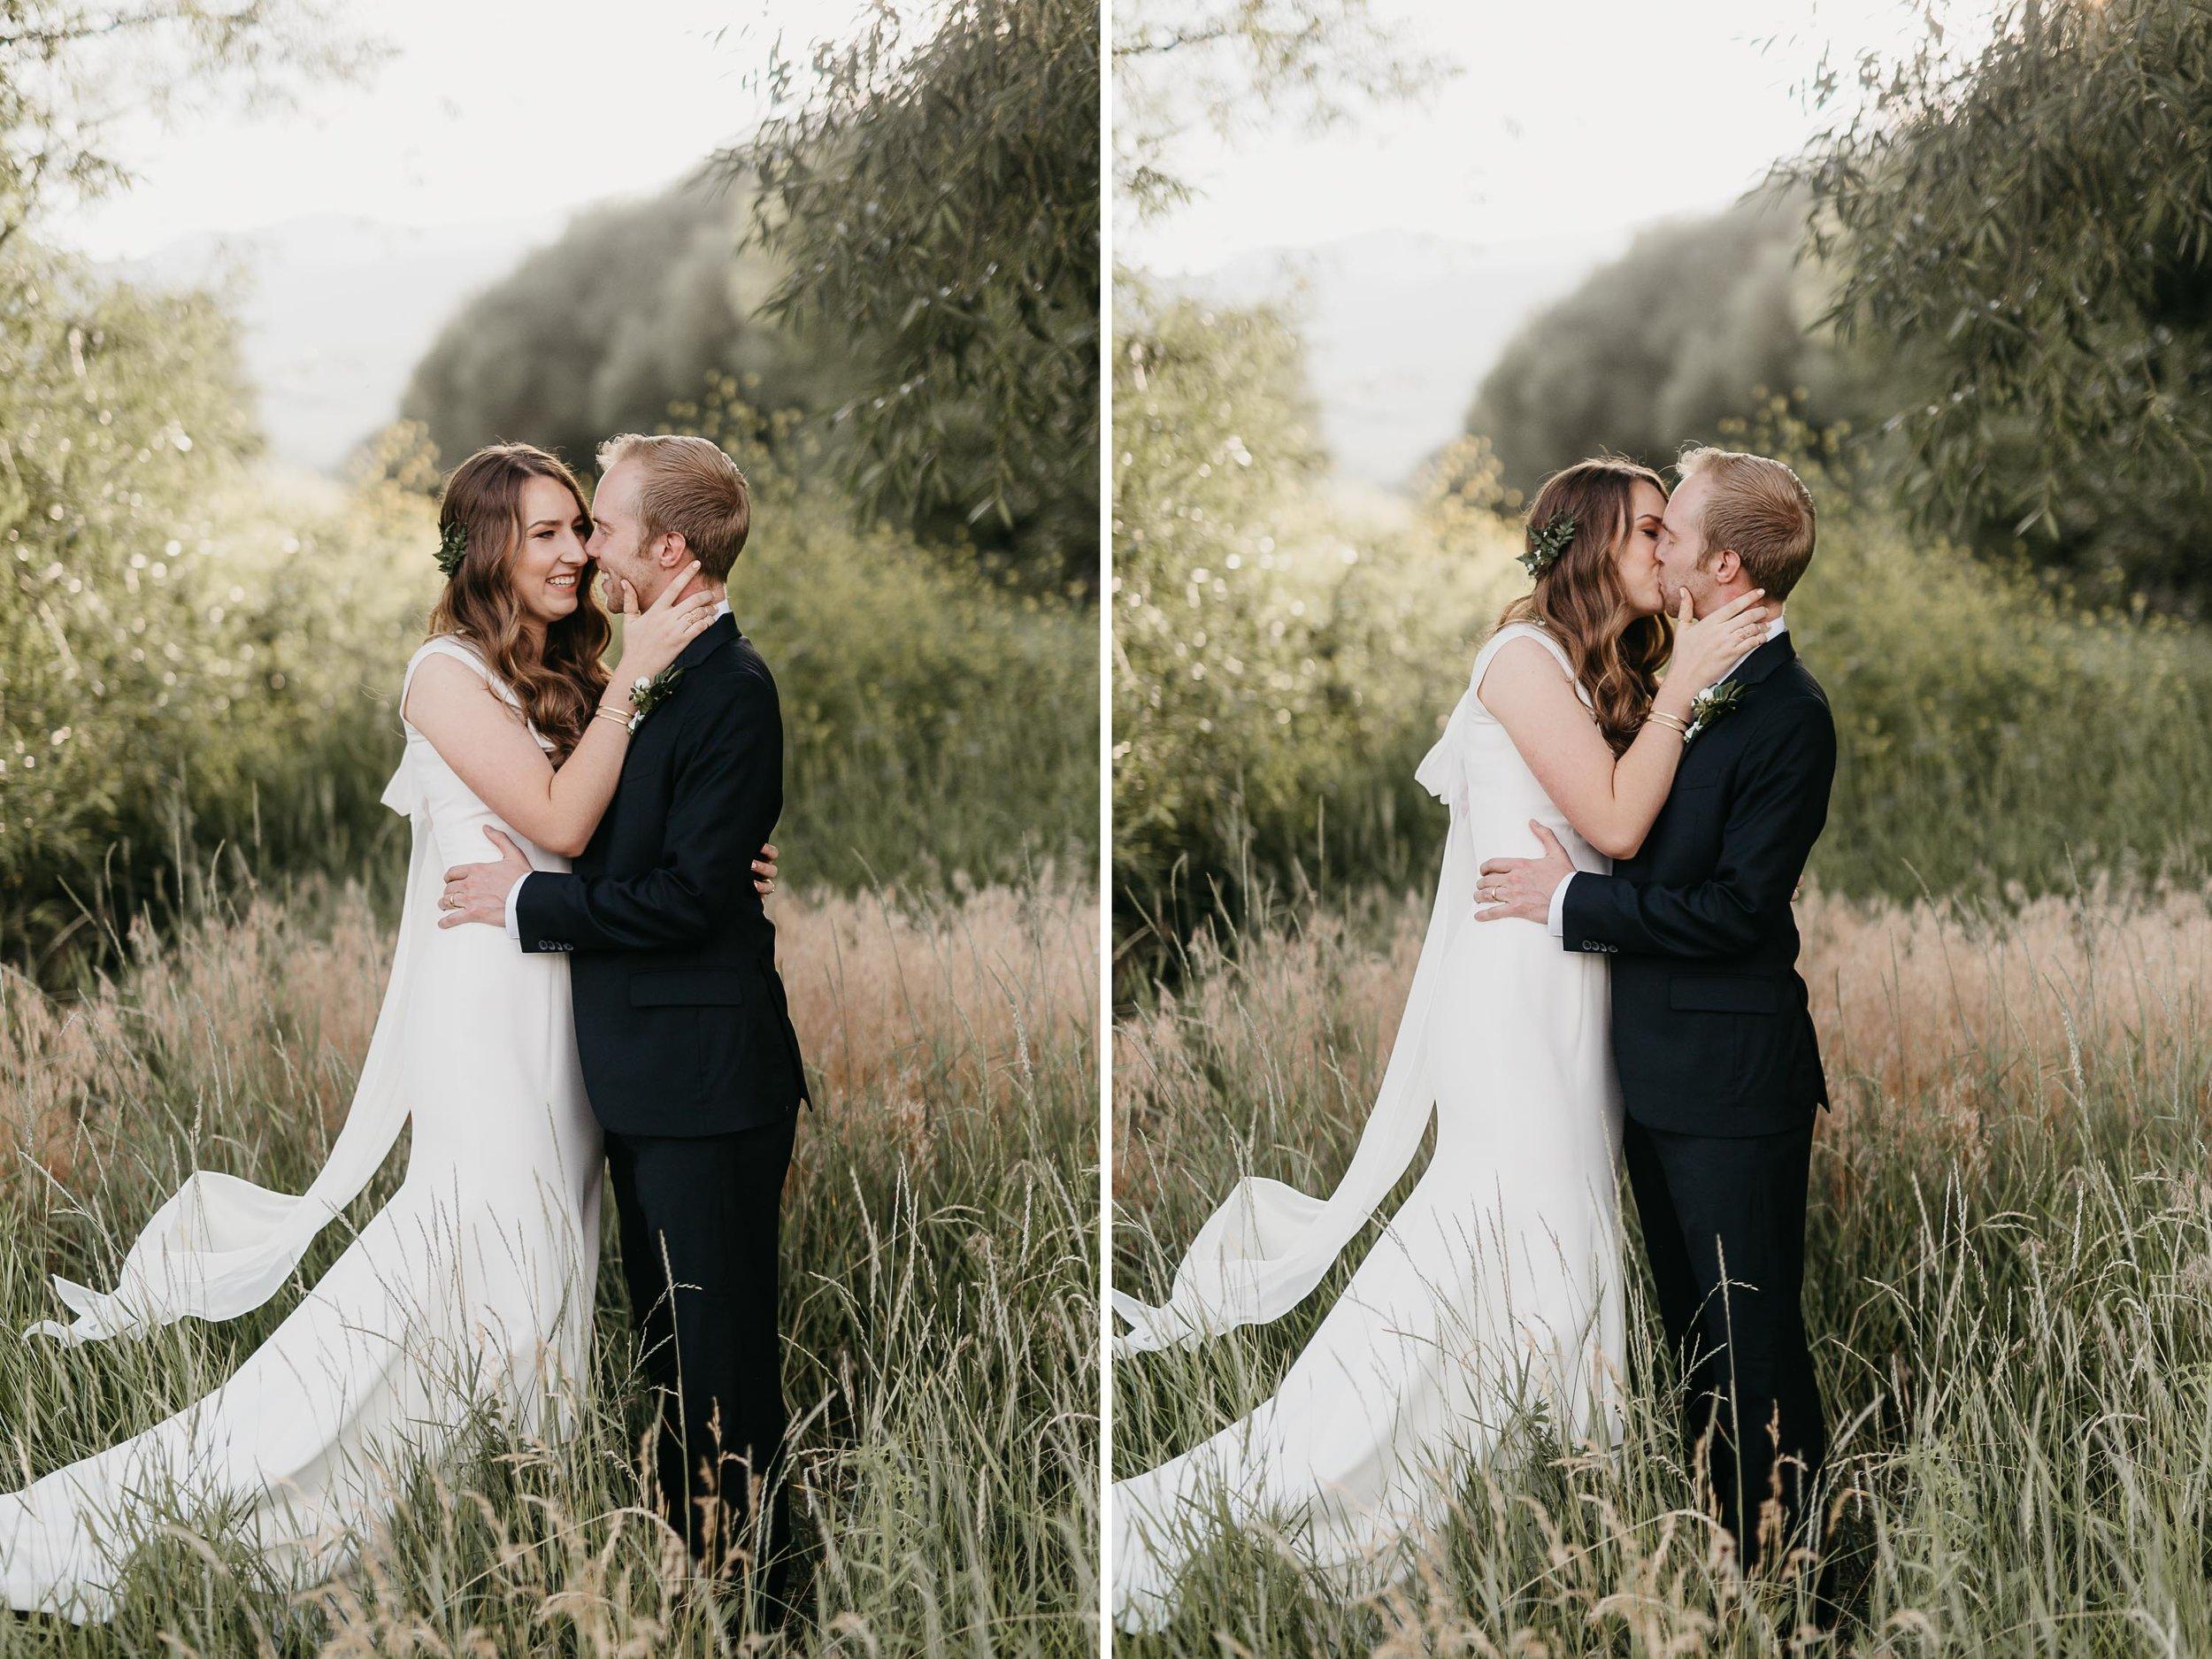 Park-City-Wedding-Photographer-05.jpg